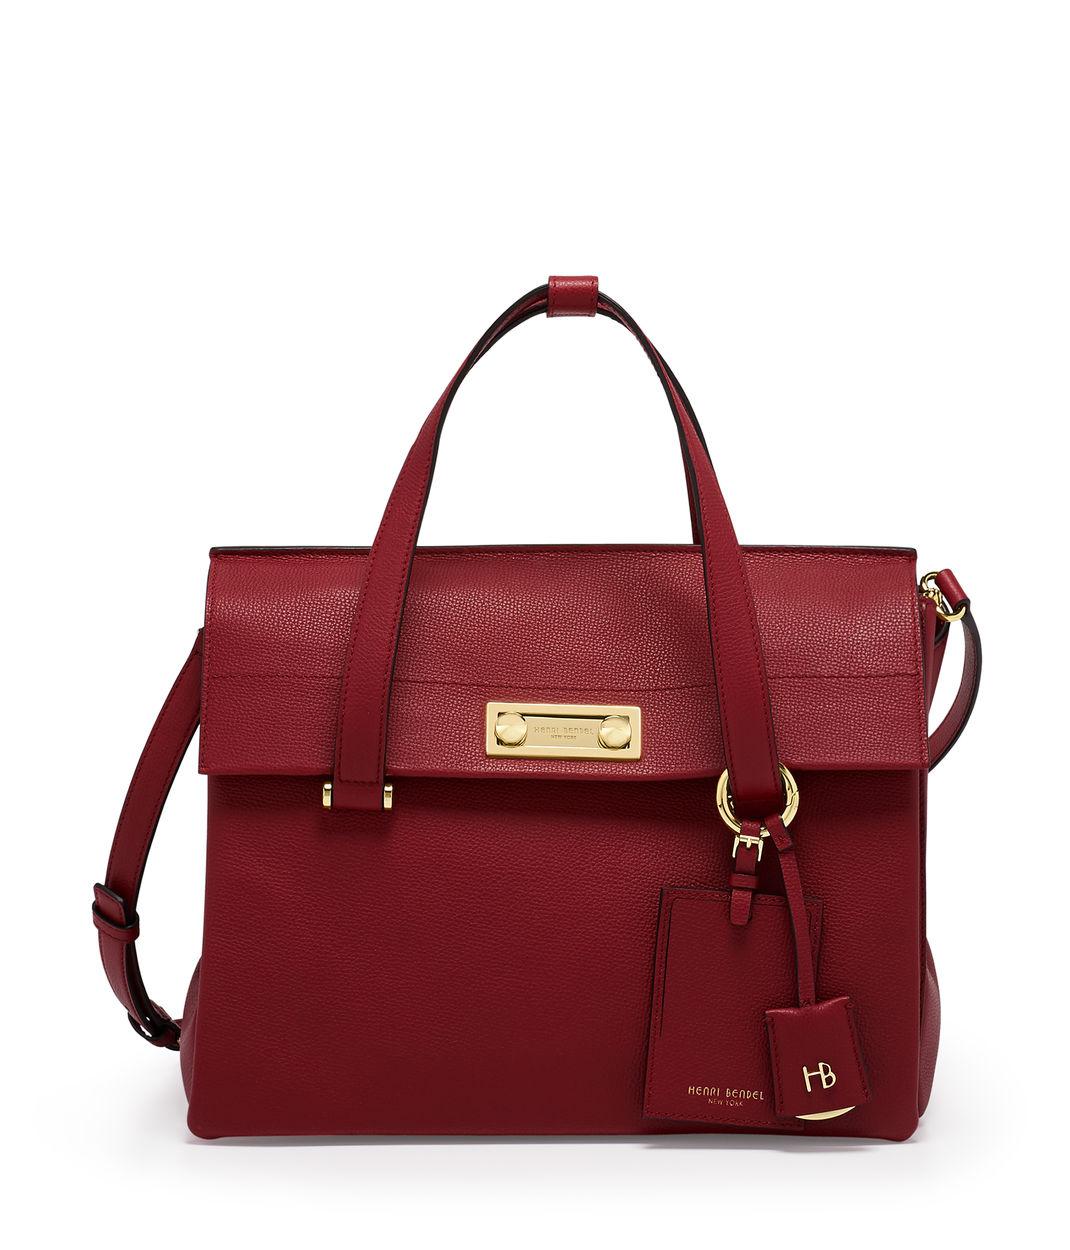 All about the bag  3f3a6bc8da